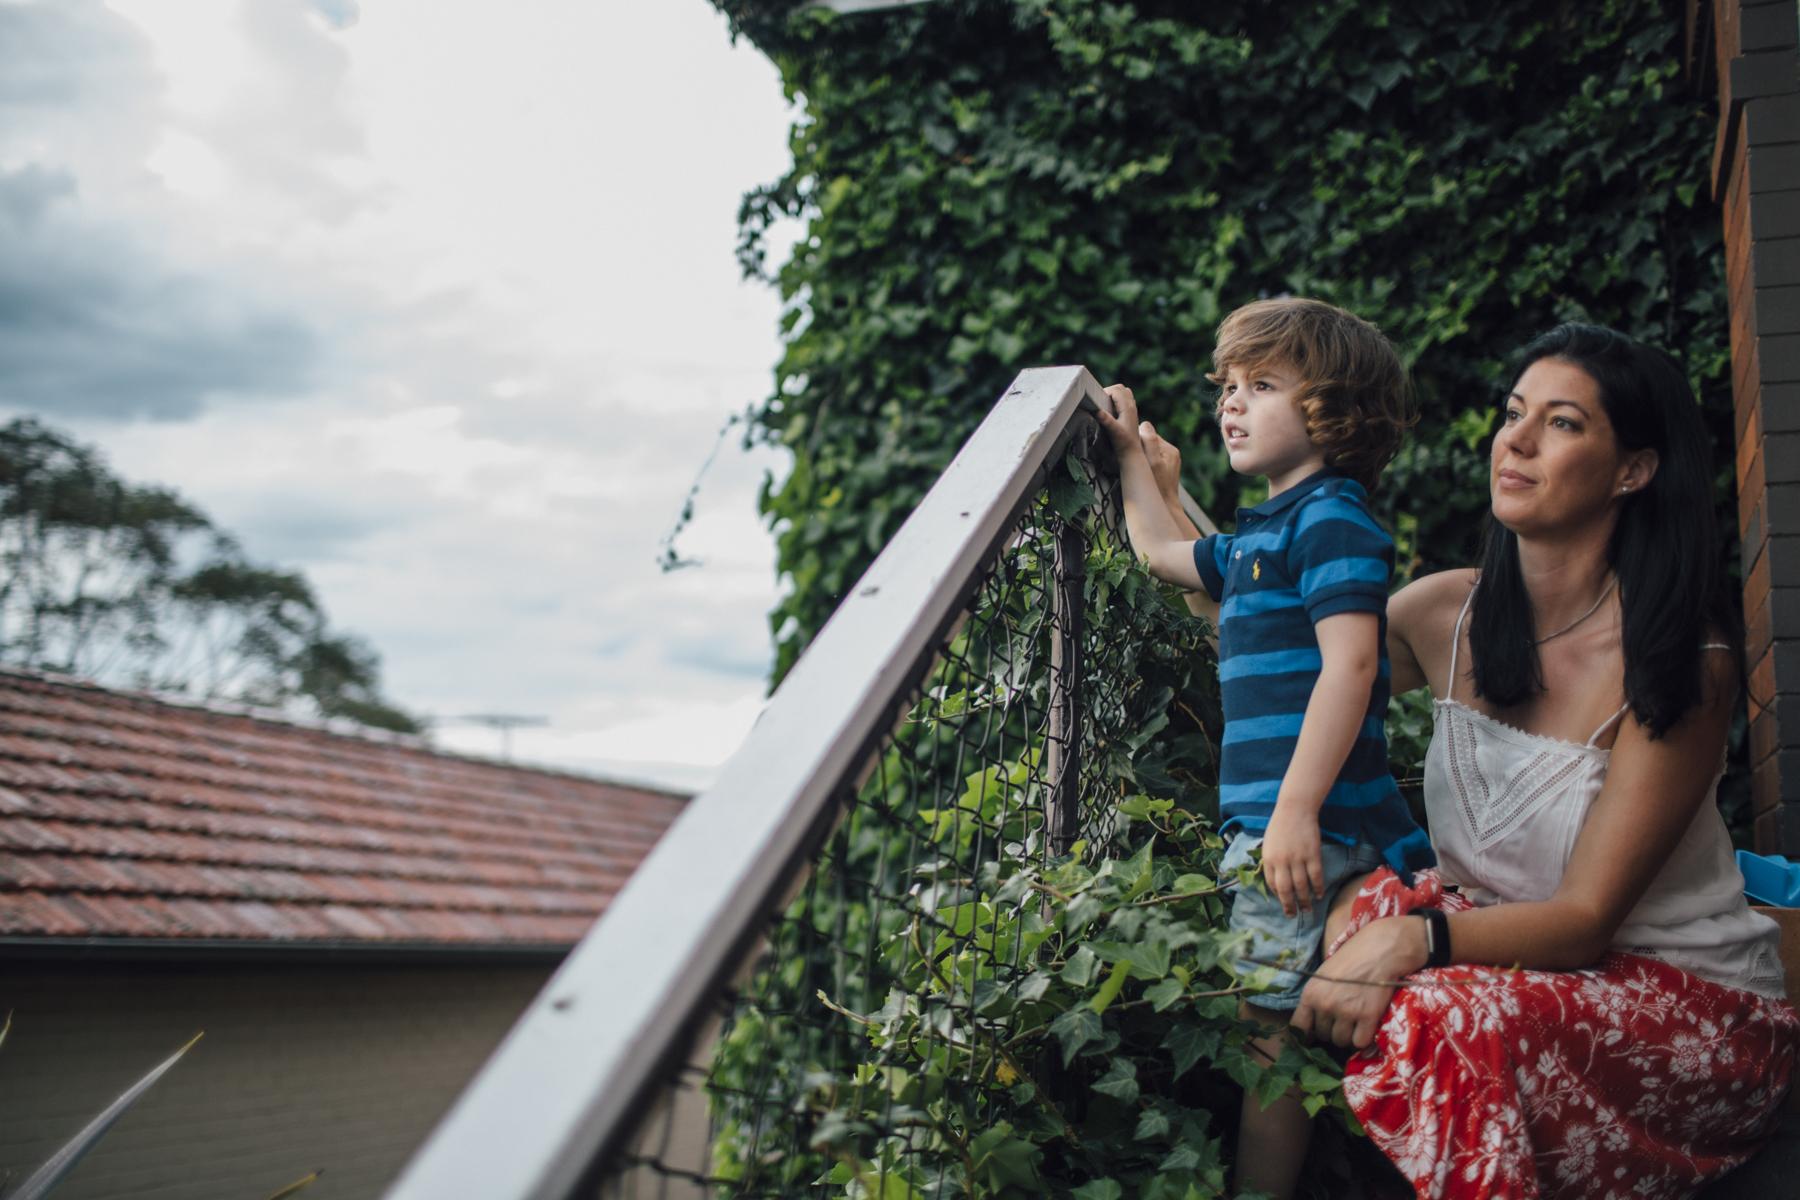 Sydney_Family_Lifestyle_Photography_Sheridan_Nilsson-8574.jpg